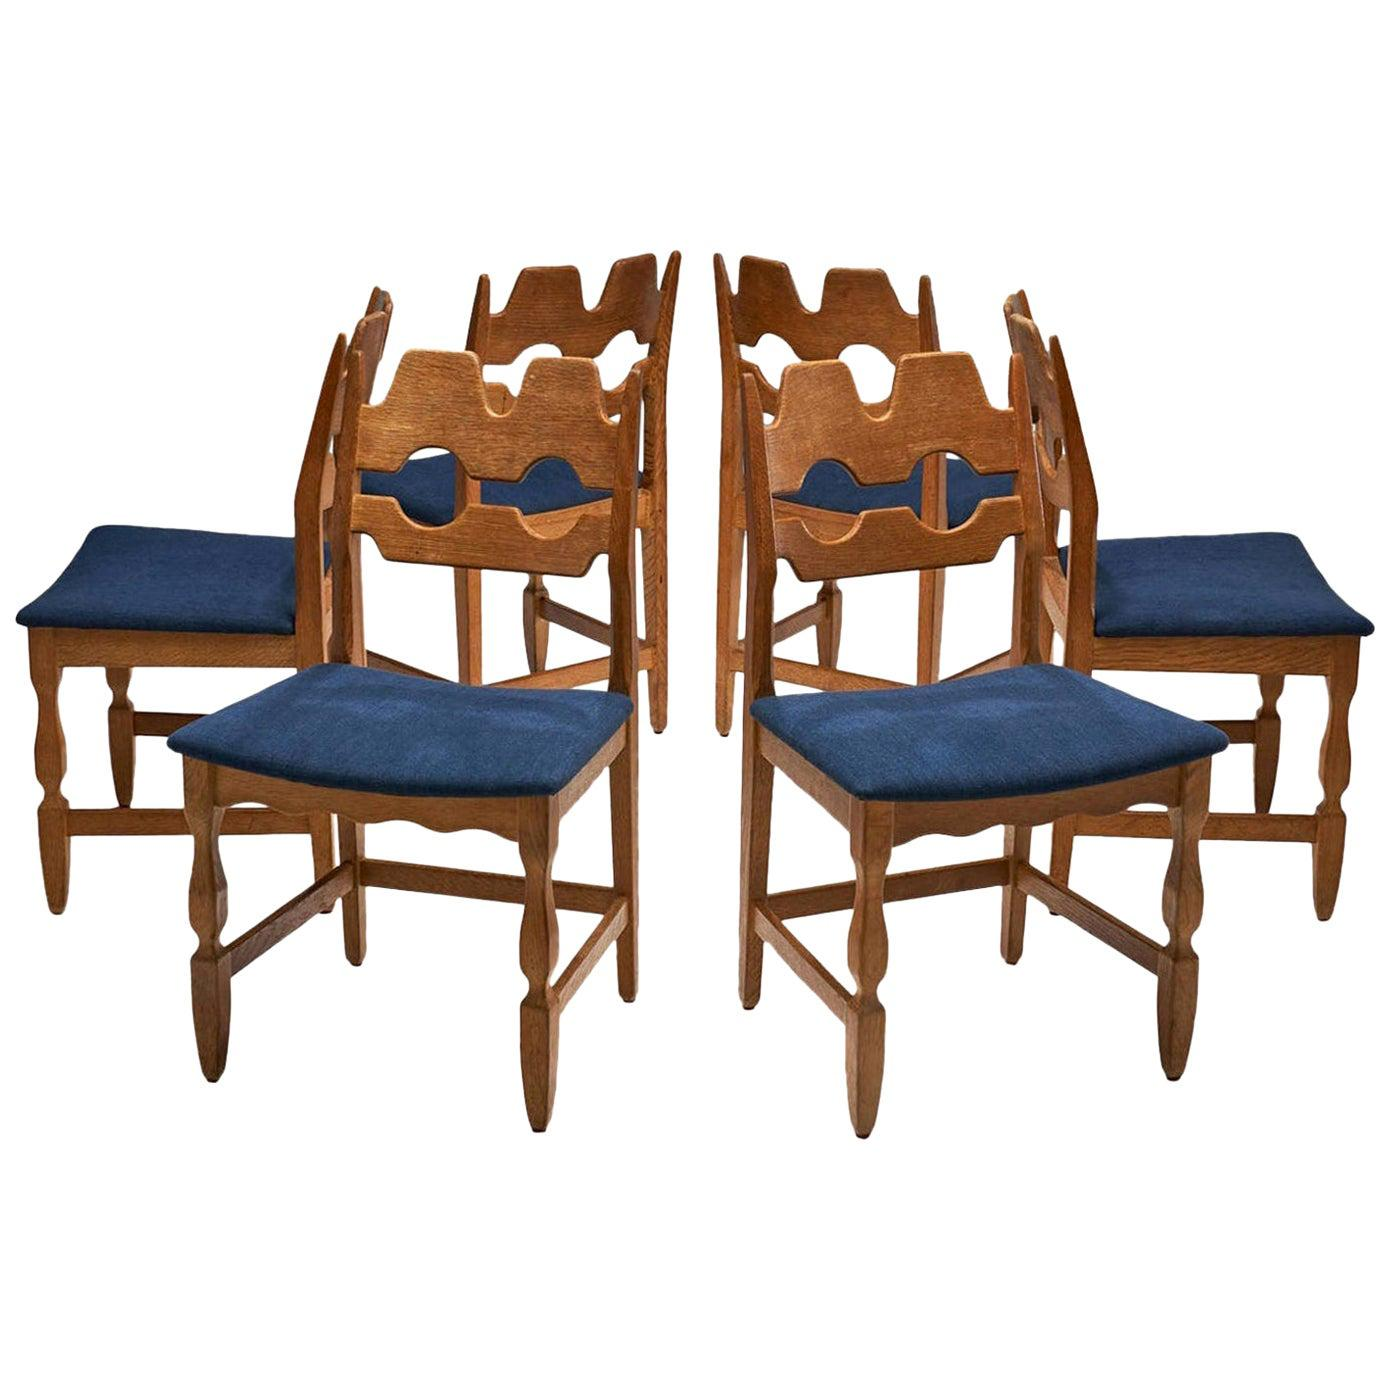 Set of 6 Razorblade Dining Chairs by Henning Kjaernulf, Denmark, 1960s